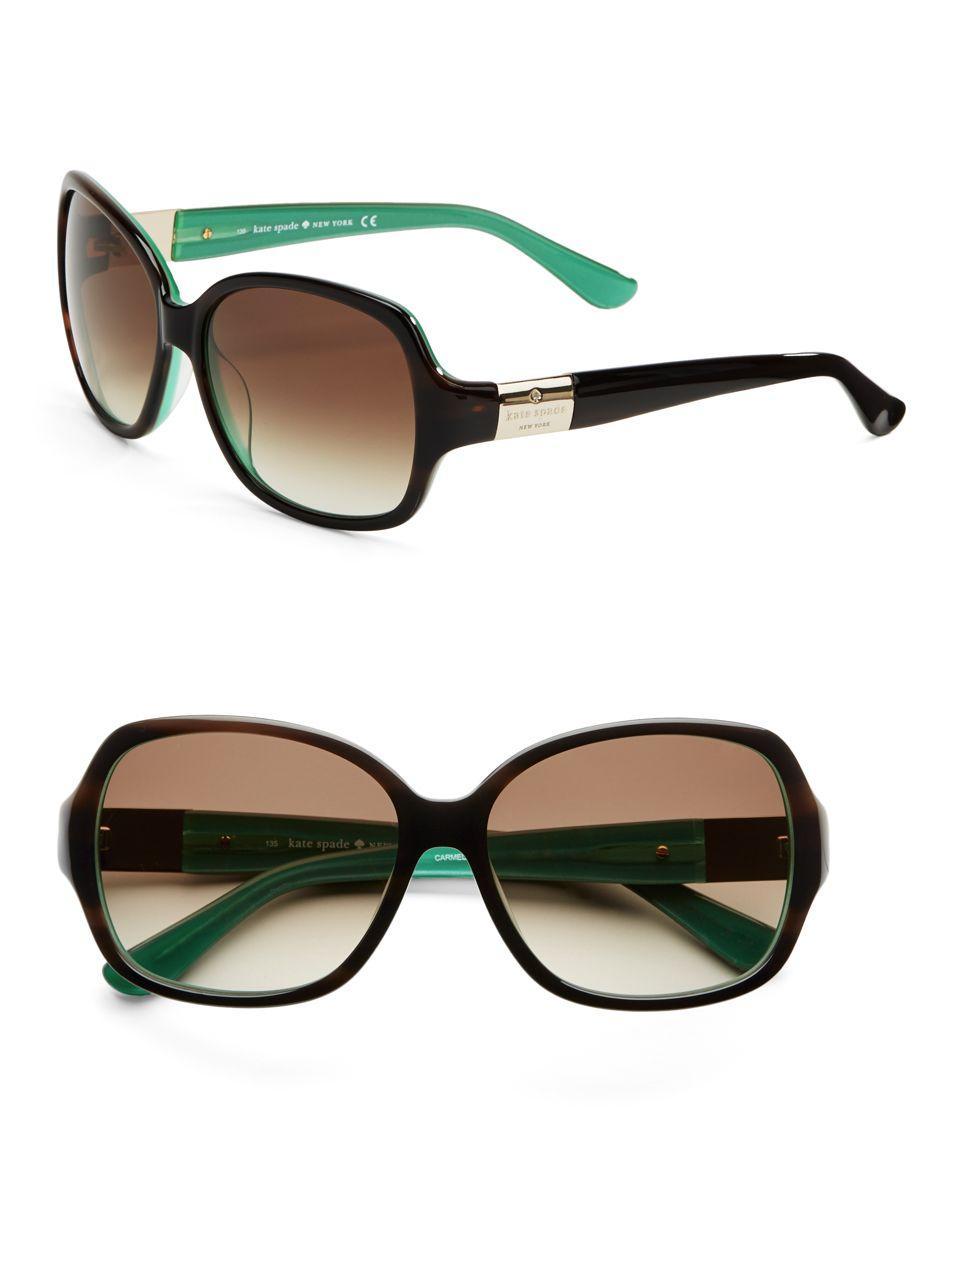 Lyst - Kate Spade Carmel Sunglasses